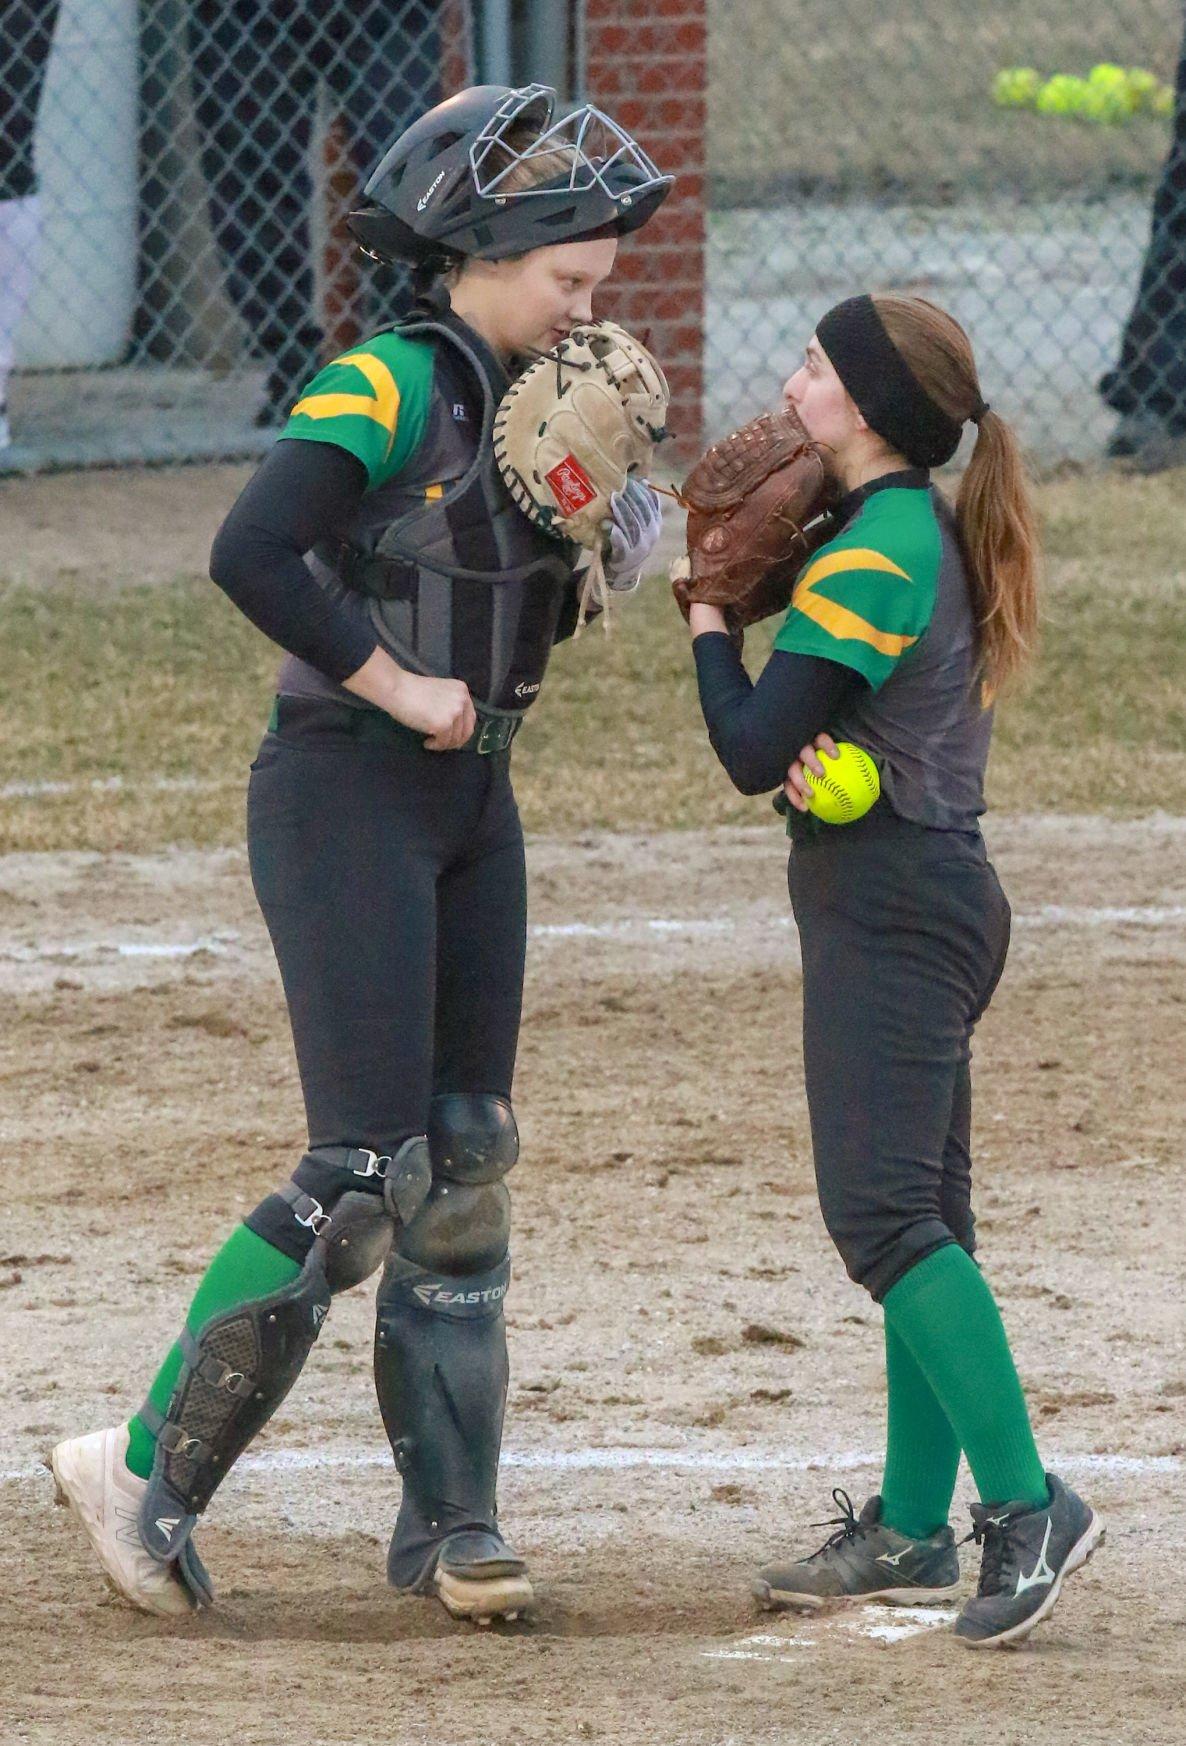 Softball - Kankakee Valley vs Morgan Township